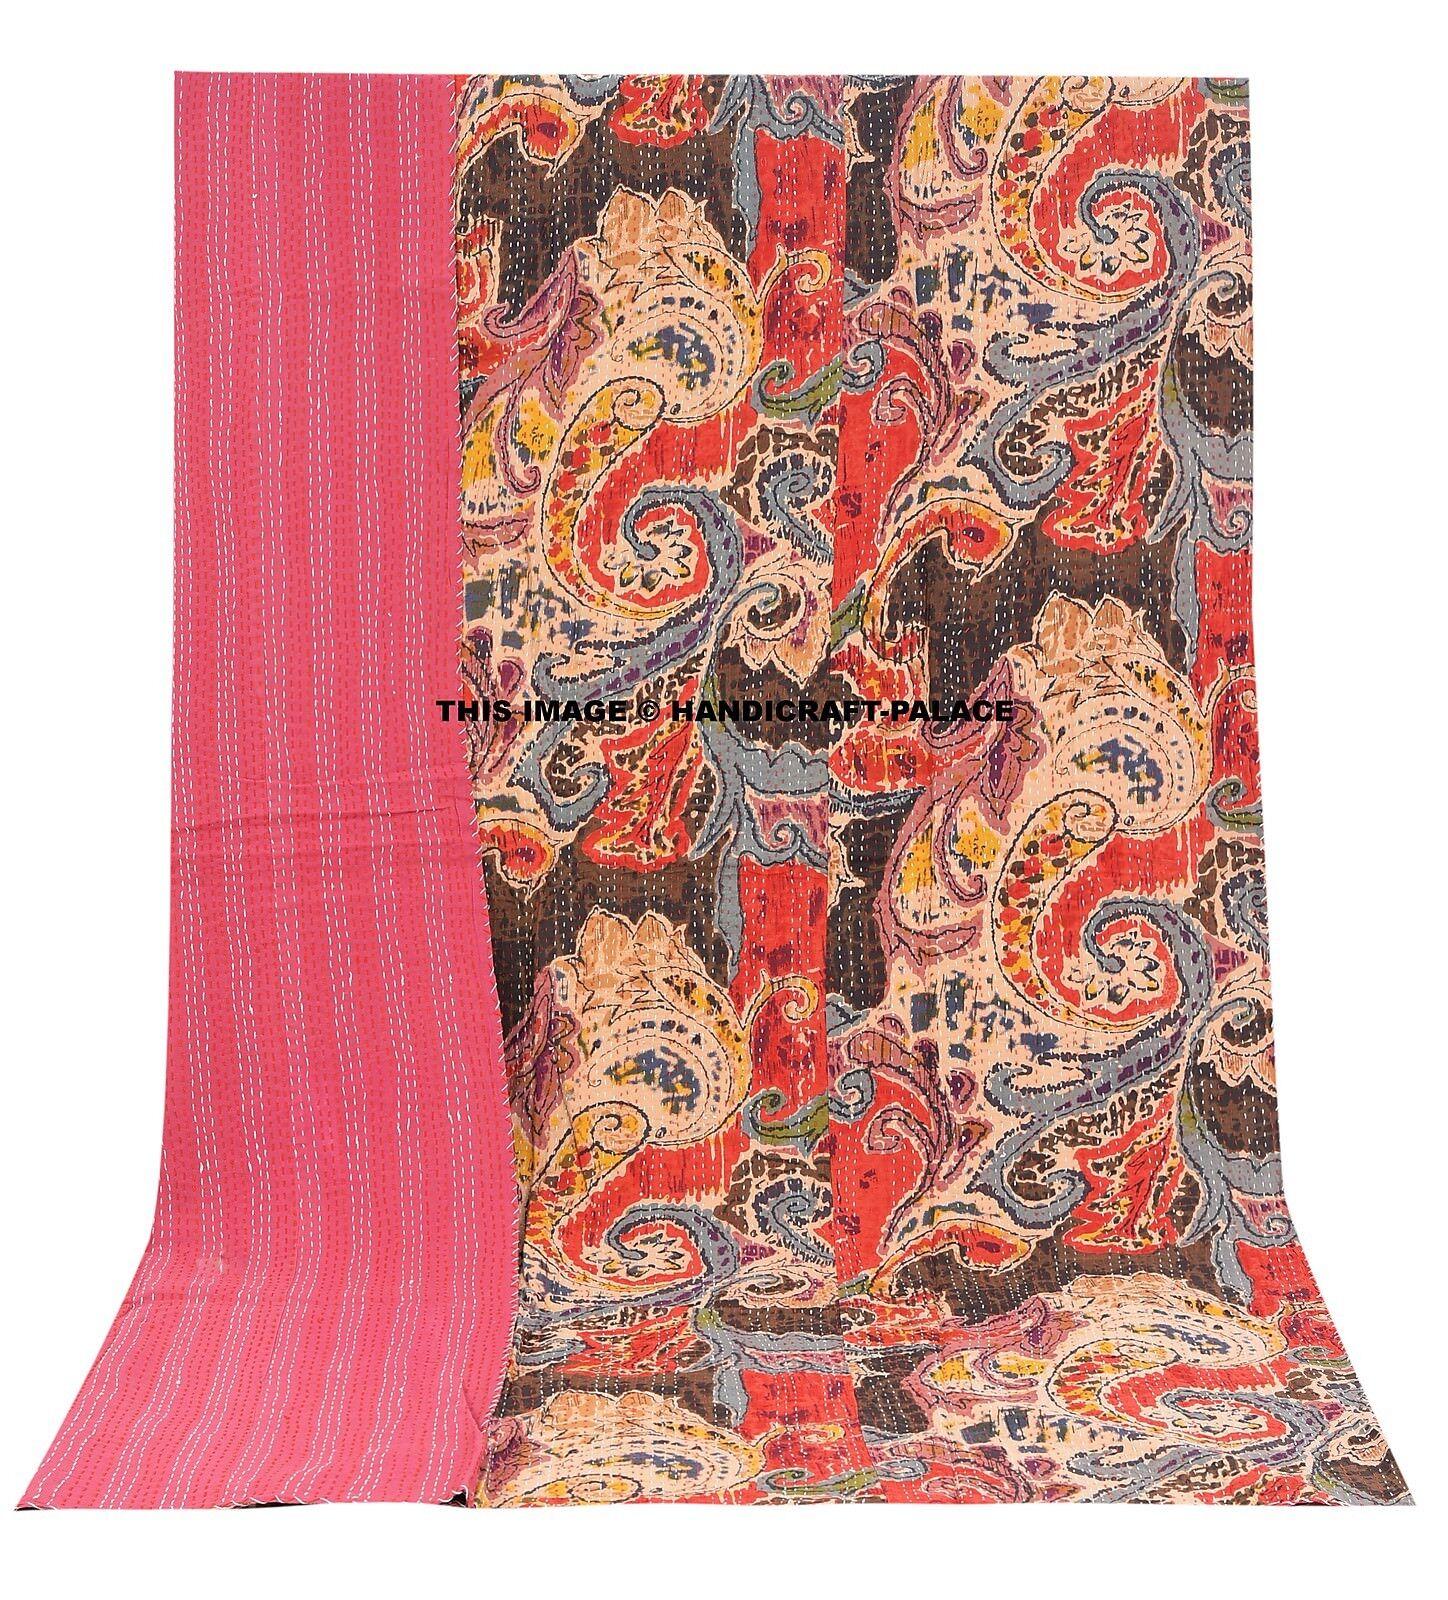 Paisley Kantha Quilt Indian Reversible Bettspread Bettding Throw Single Blanket